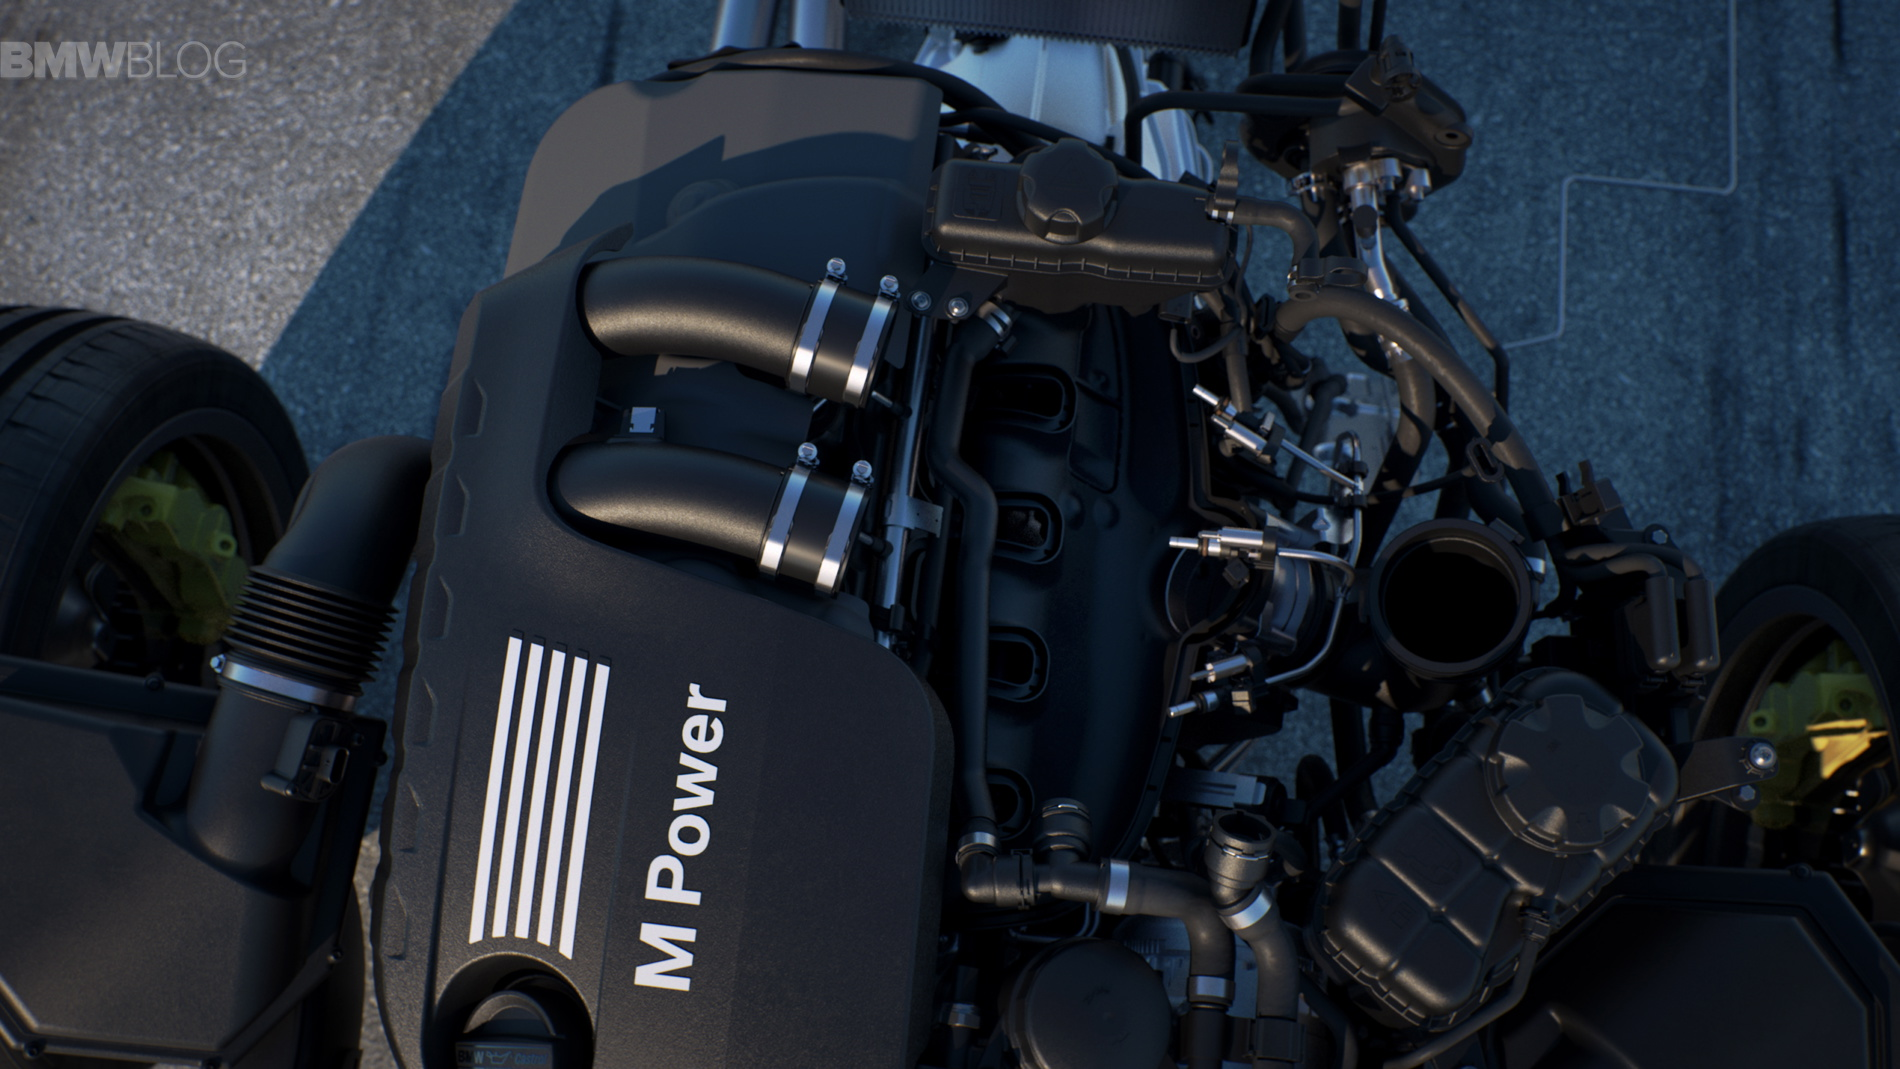 world premiere bmw m4 motogp safety car with water injection. Black Bedroom Furniture Sets. Home Design Ideas